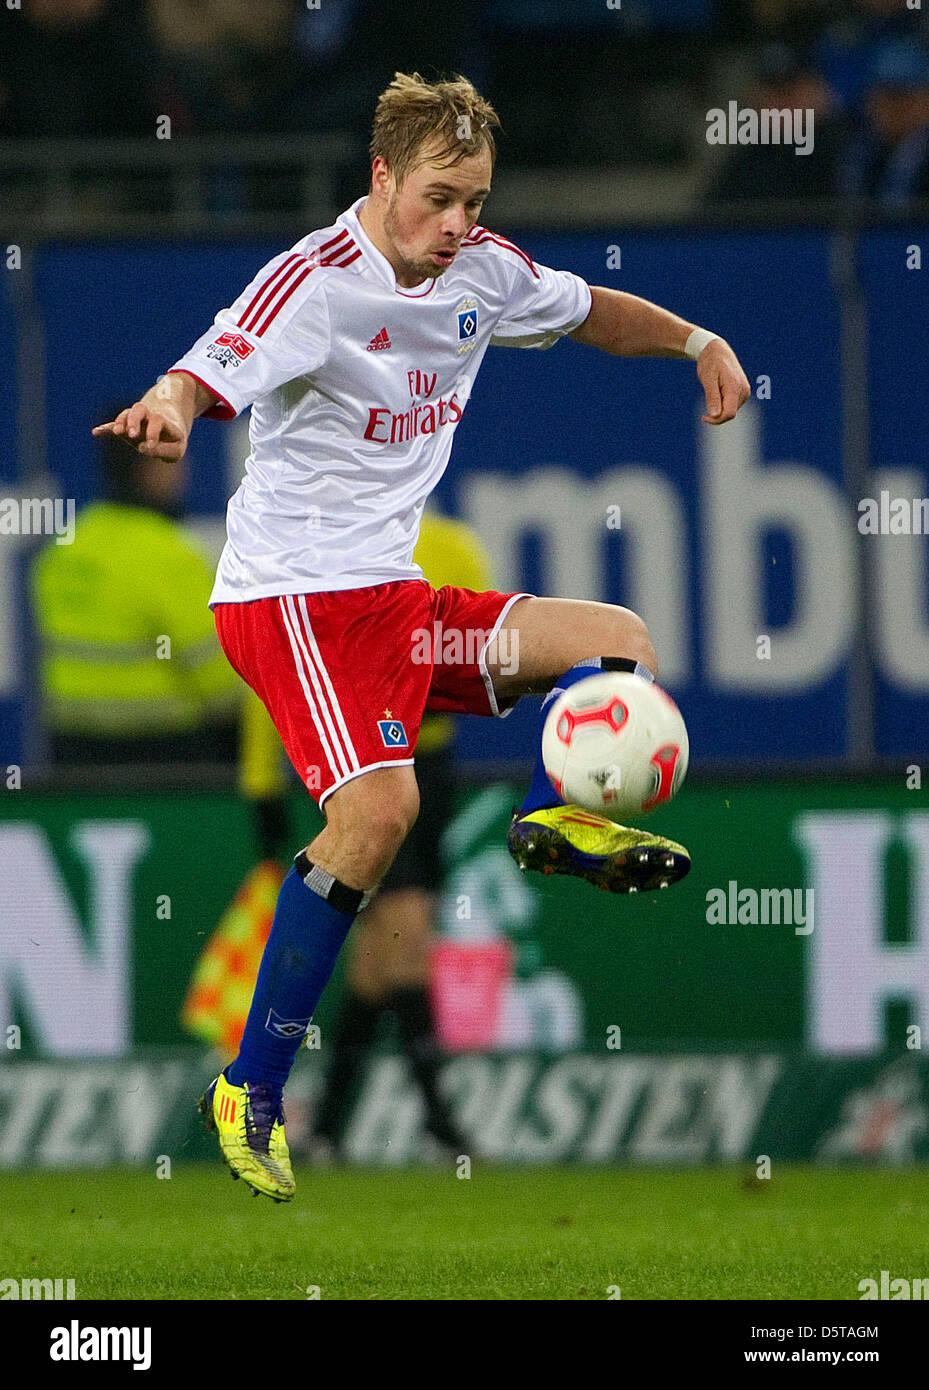 Hamburg's Maximilian Beister controls the ball during the Bundesliga soccer match between Hamburger SV vs FSV - Stock Image